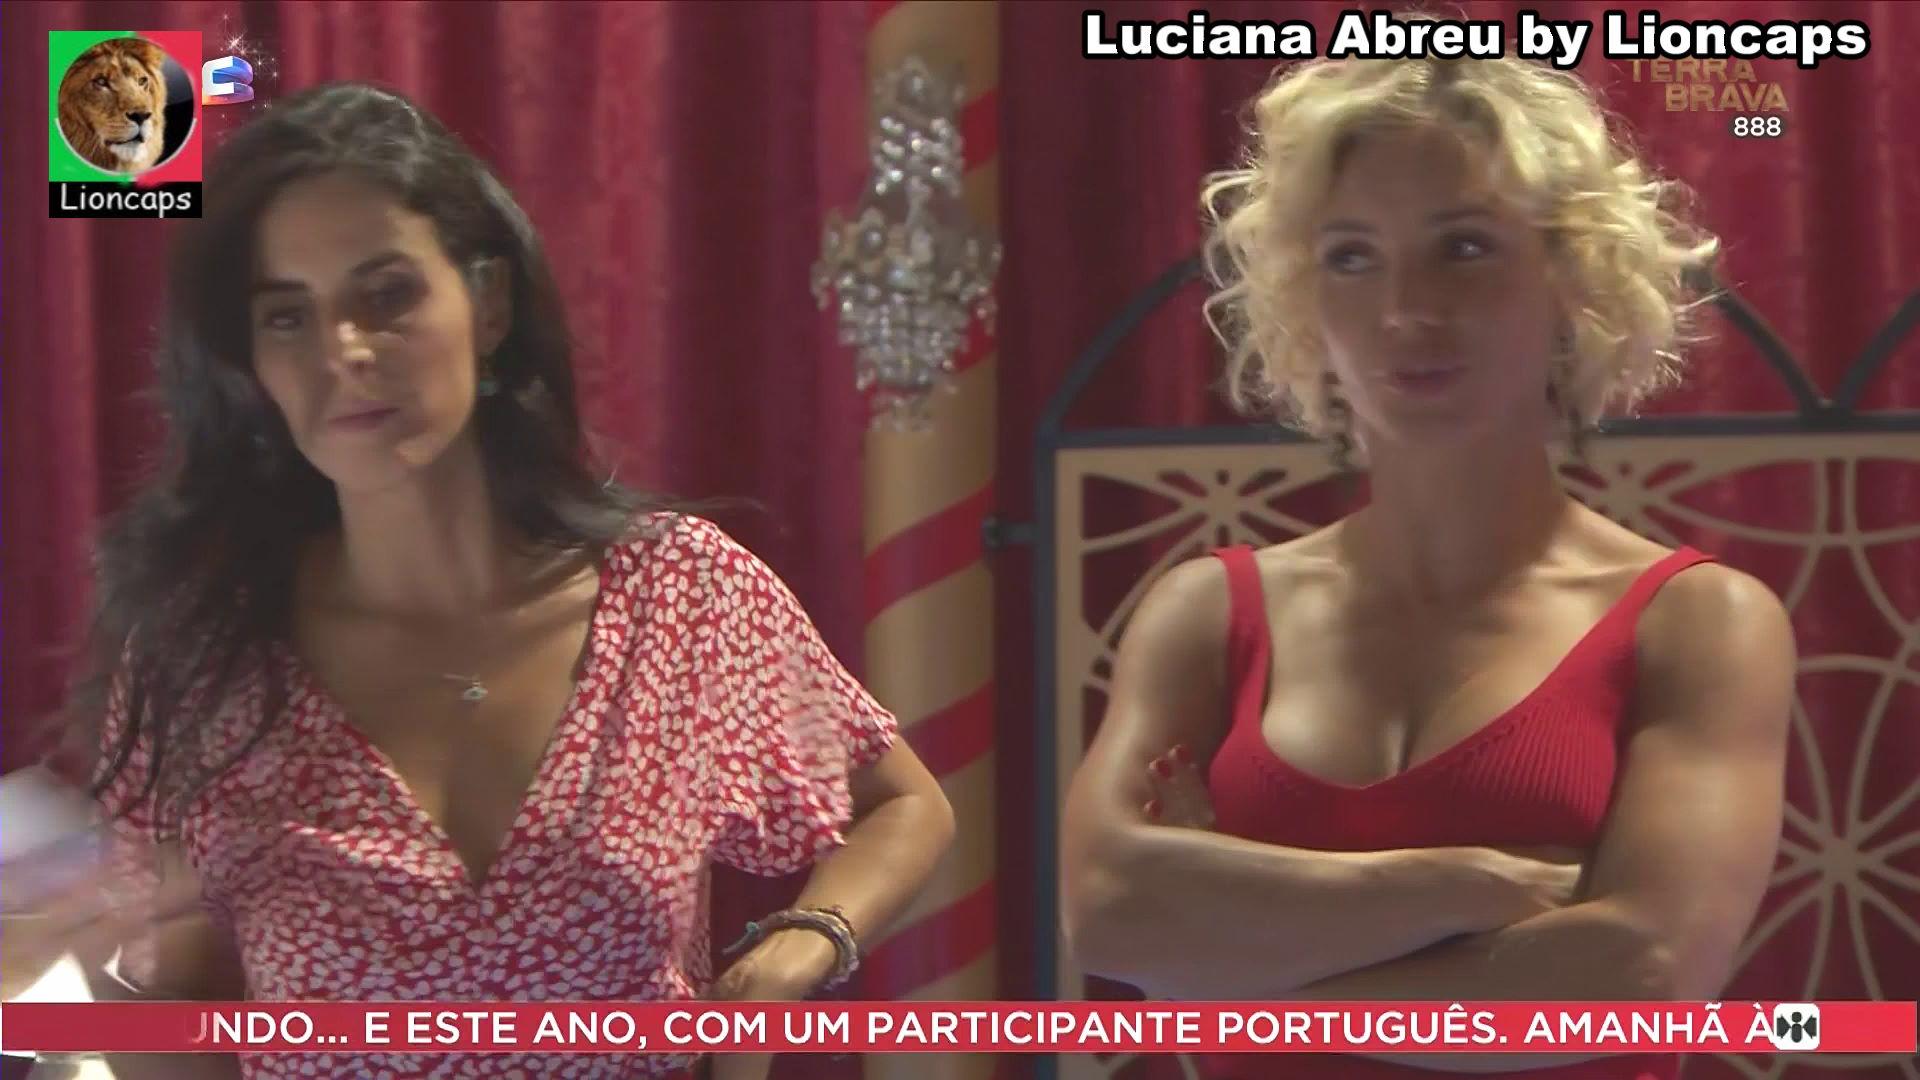 017071577_luciana_abreu_vs191222_02416_122_48lo.JPG